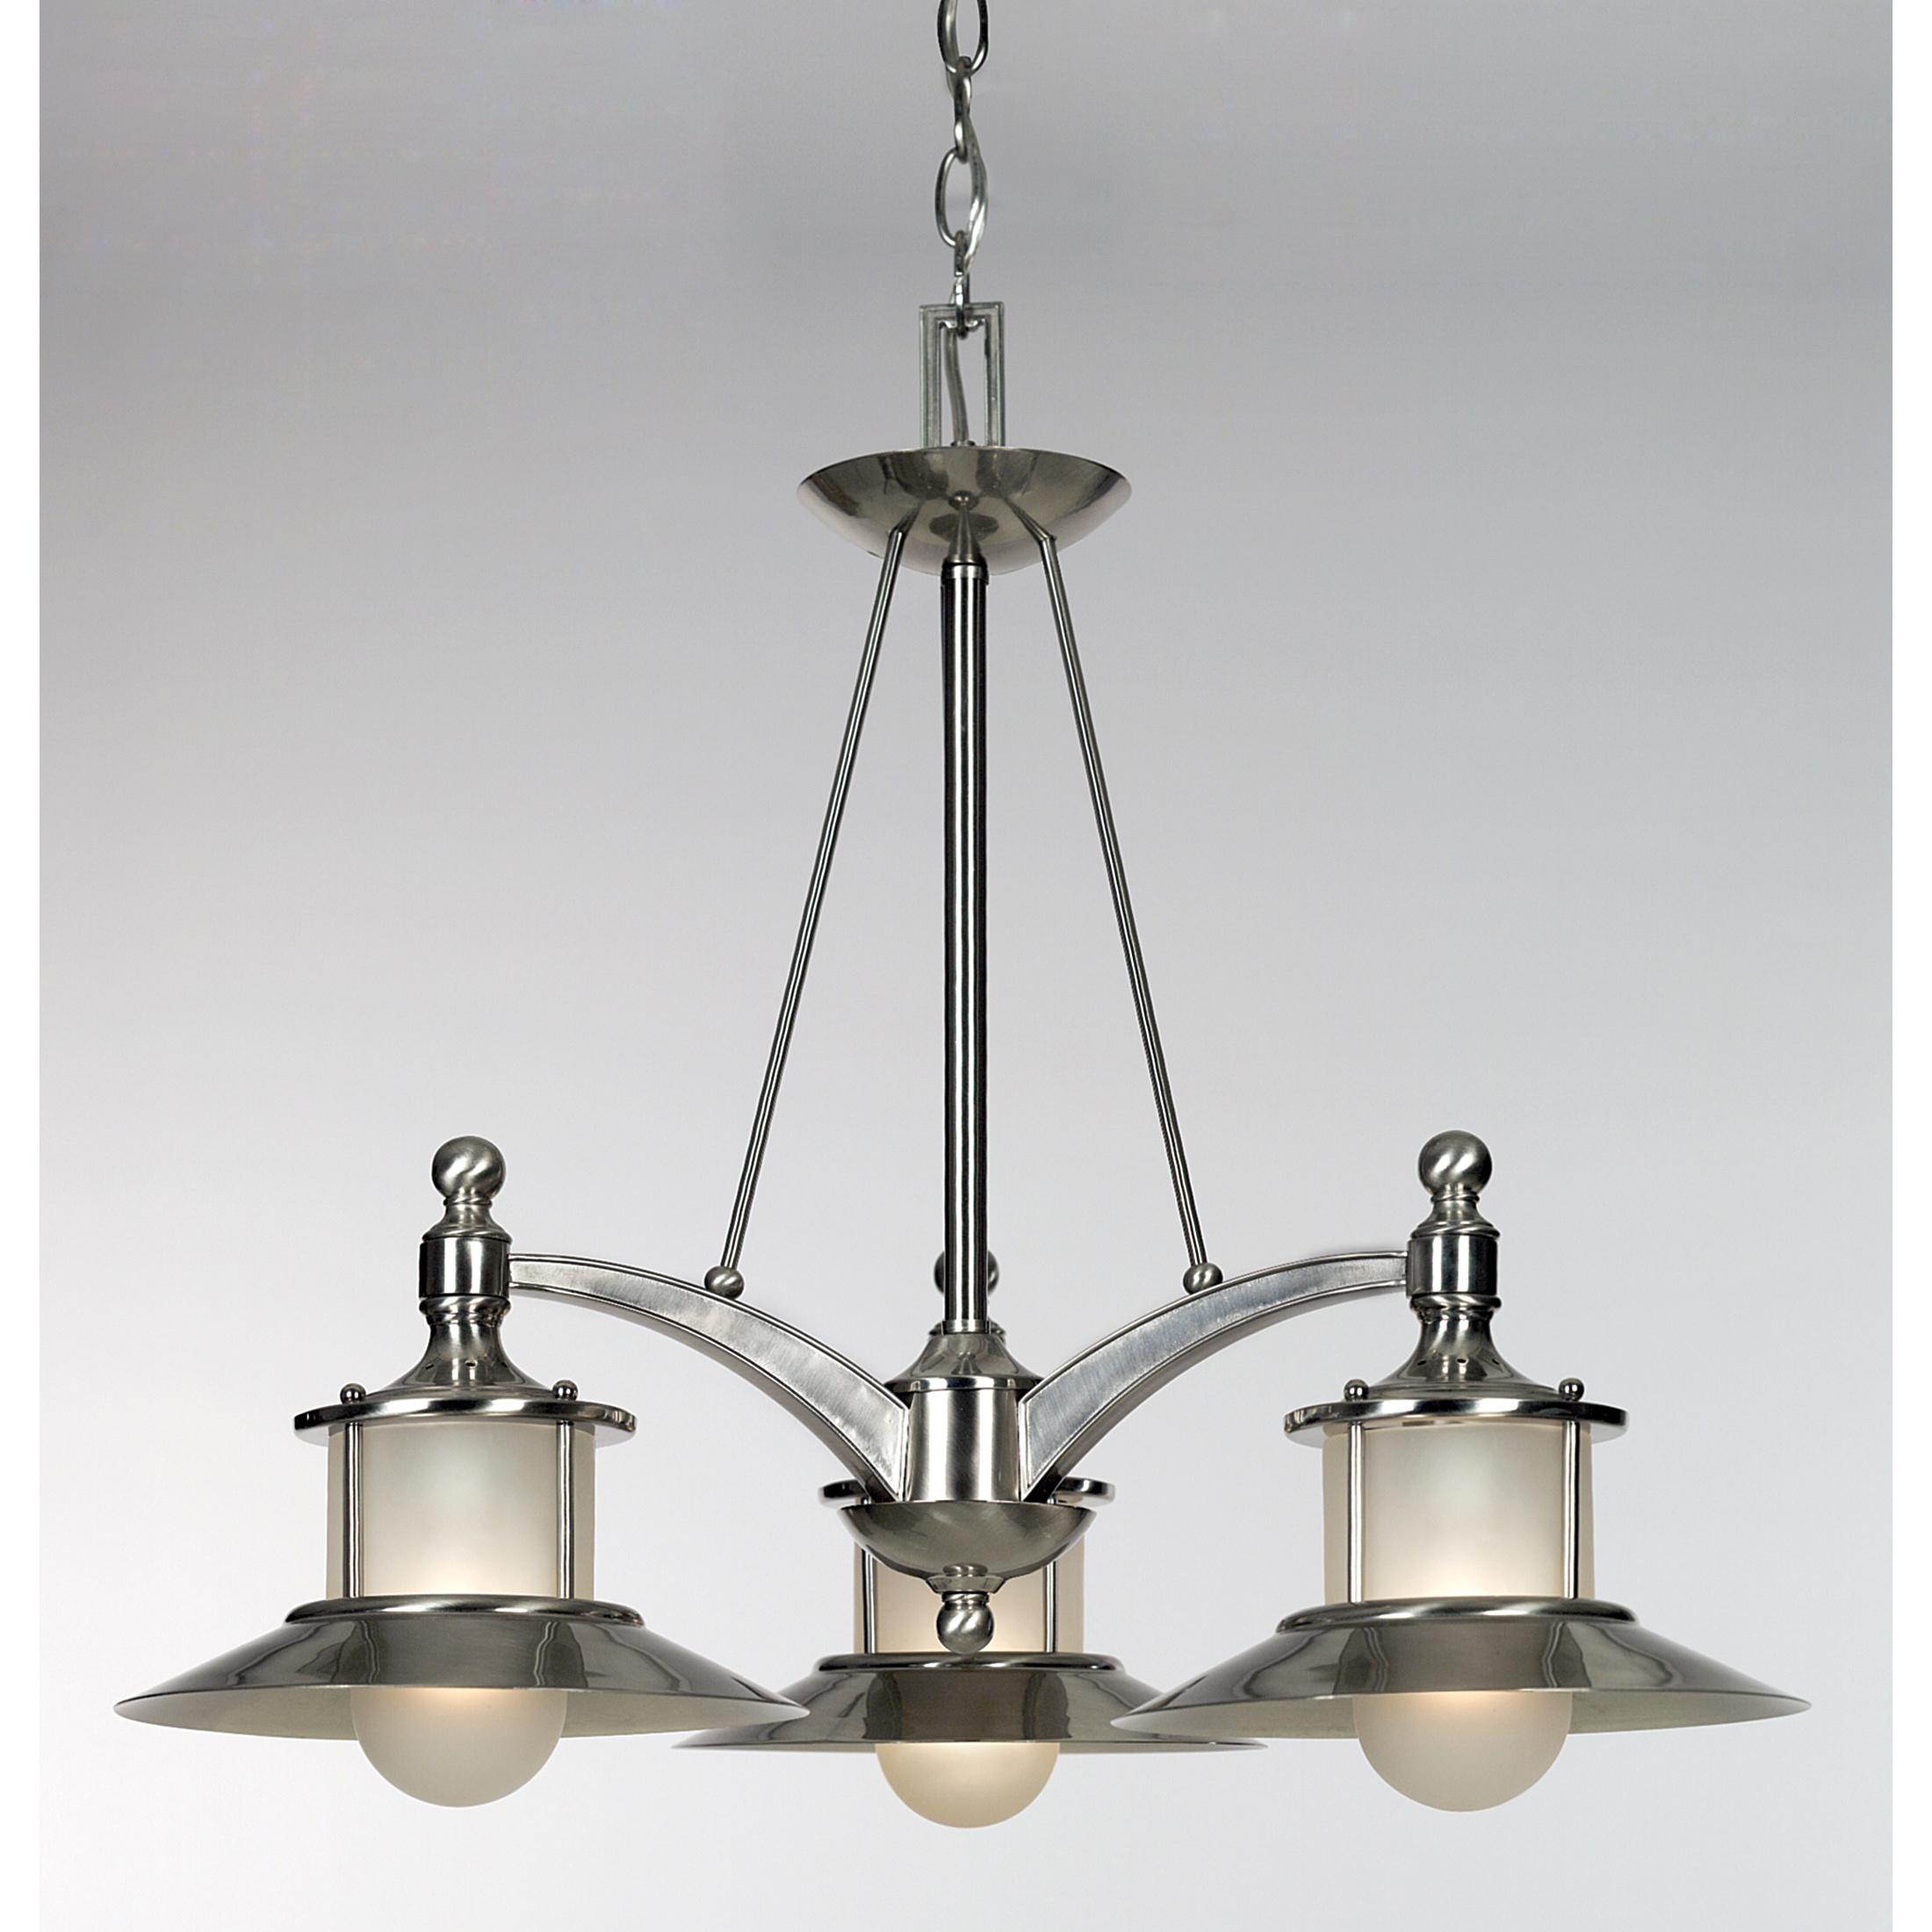 Quoizel New England 3-Light Pendant